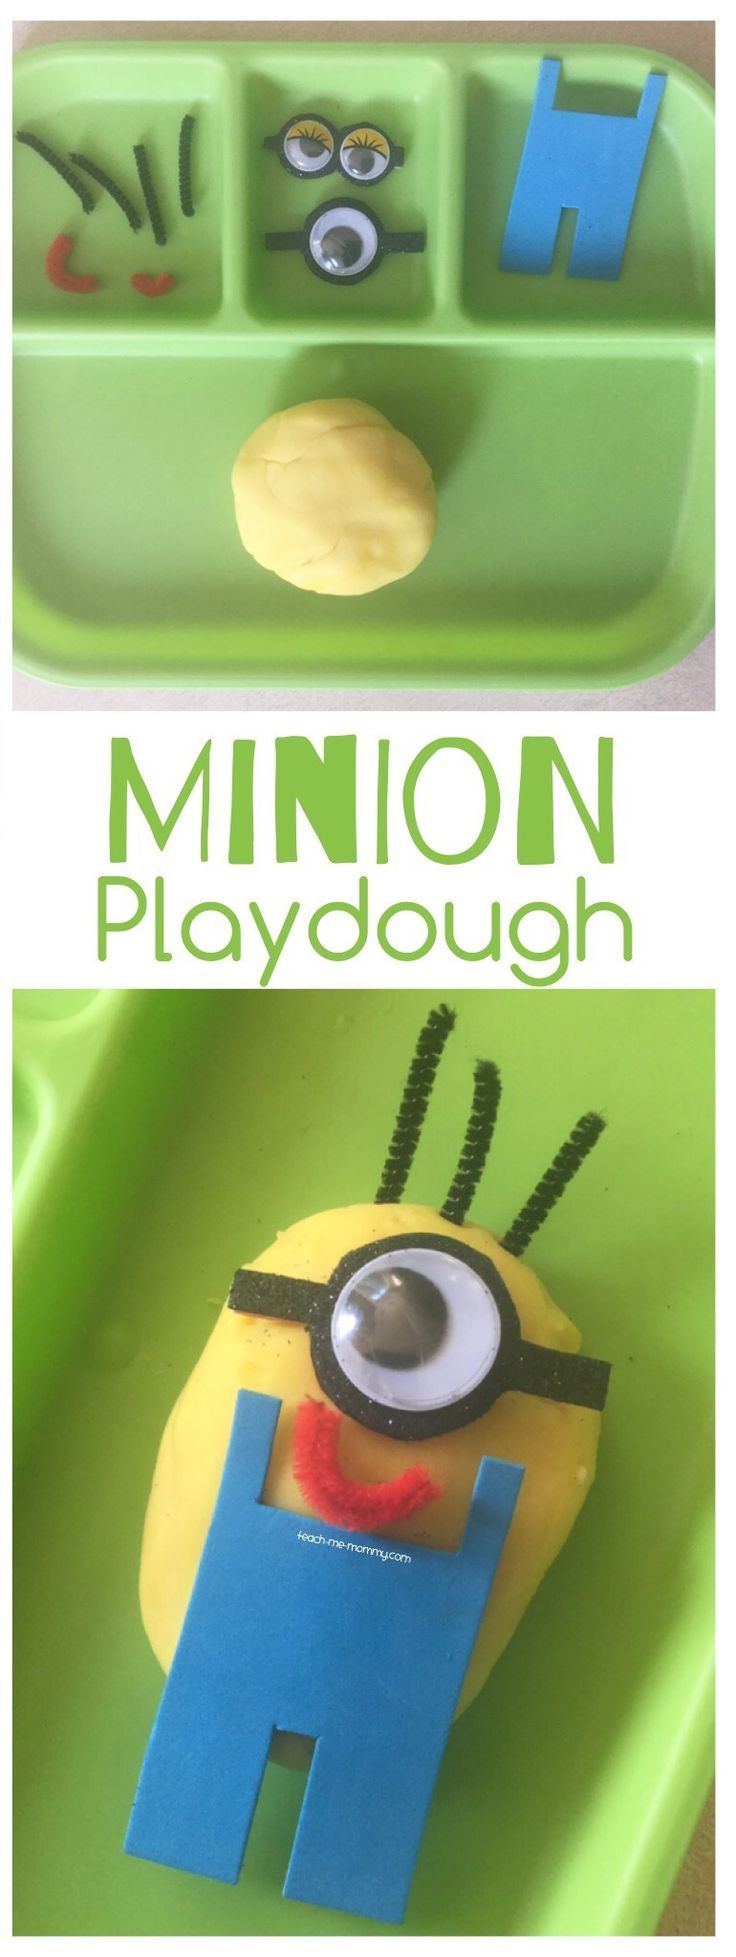 Minion Playdough, invitation to play and build a minion with playdough! #justplayathome